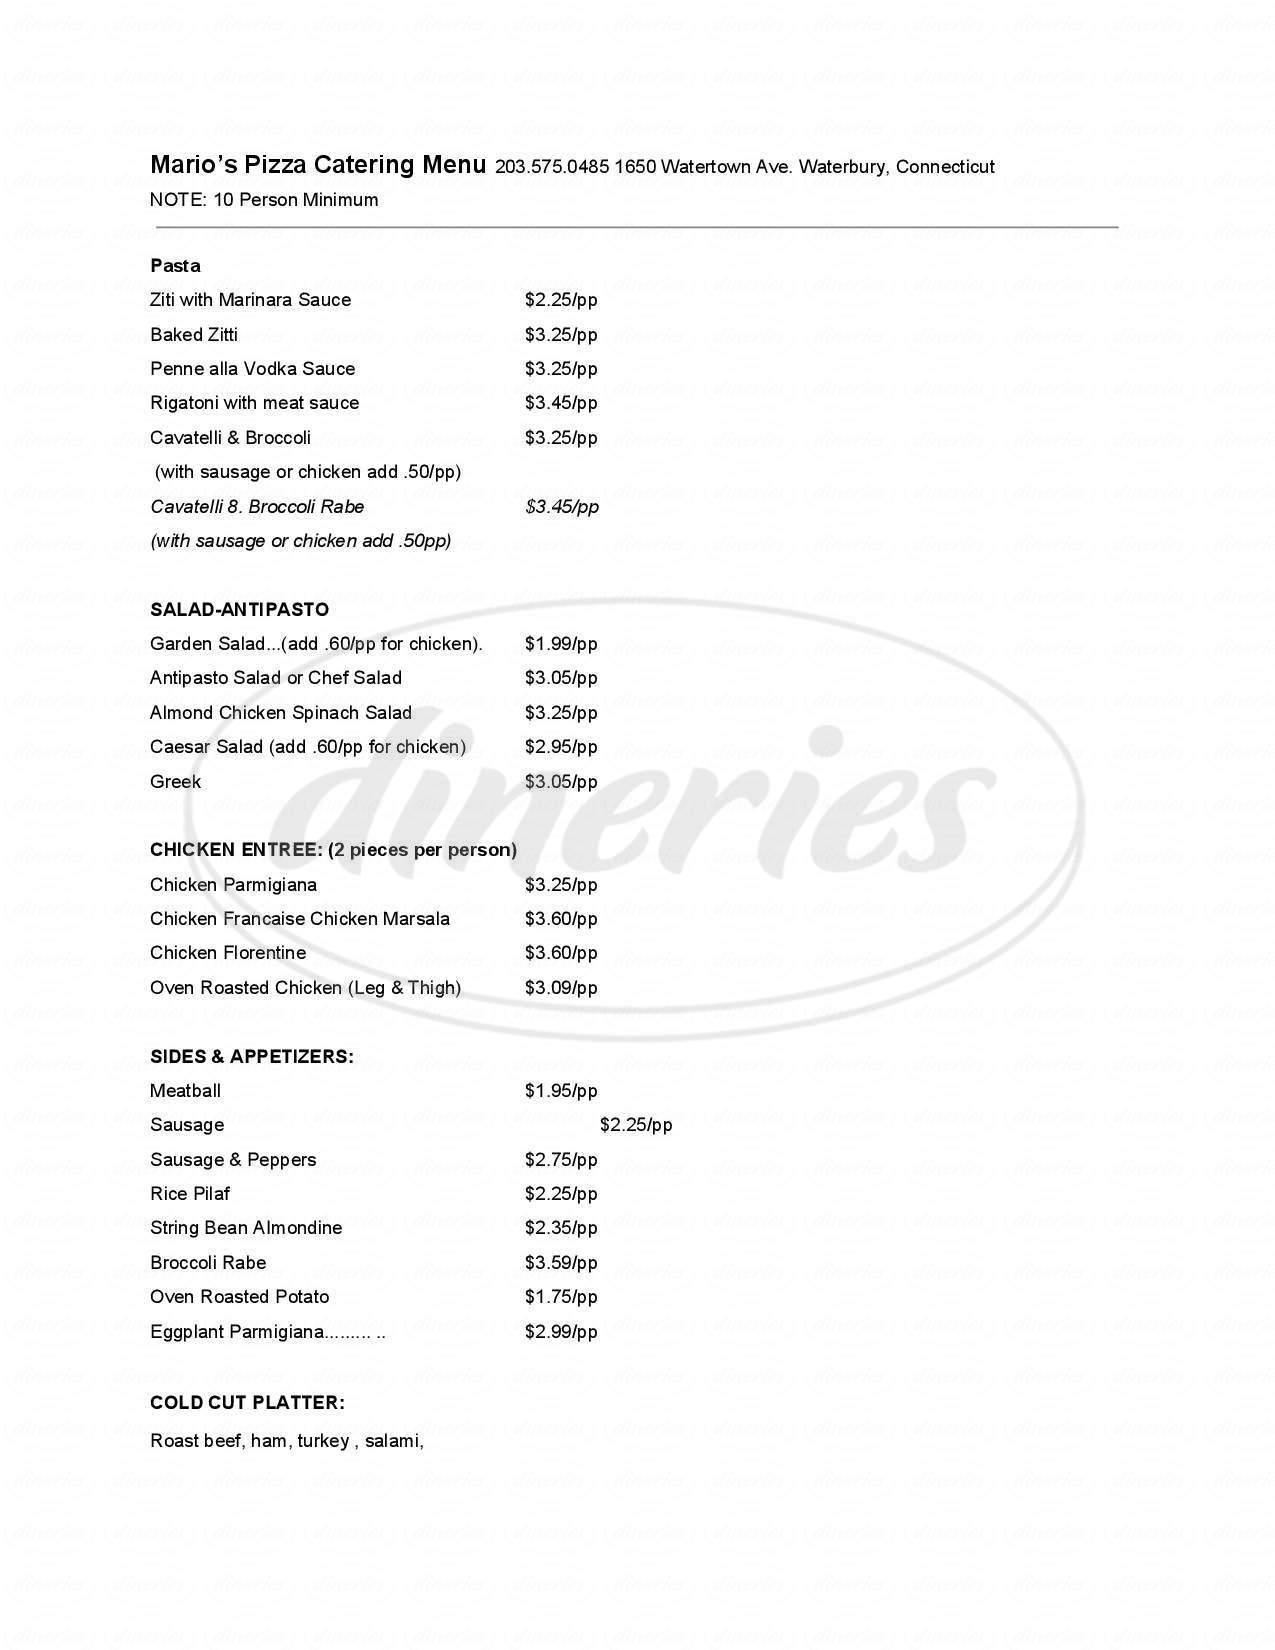 menu for Mario's Pizza Italian Restaurant